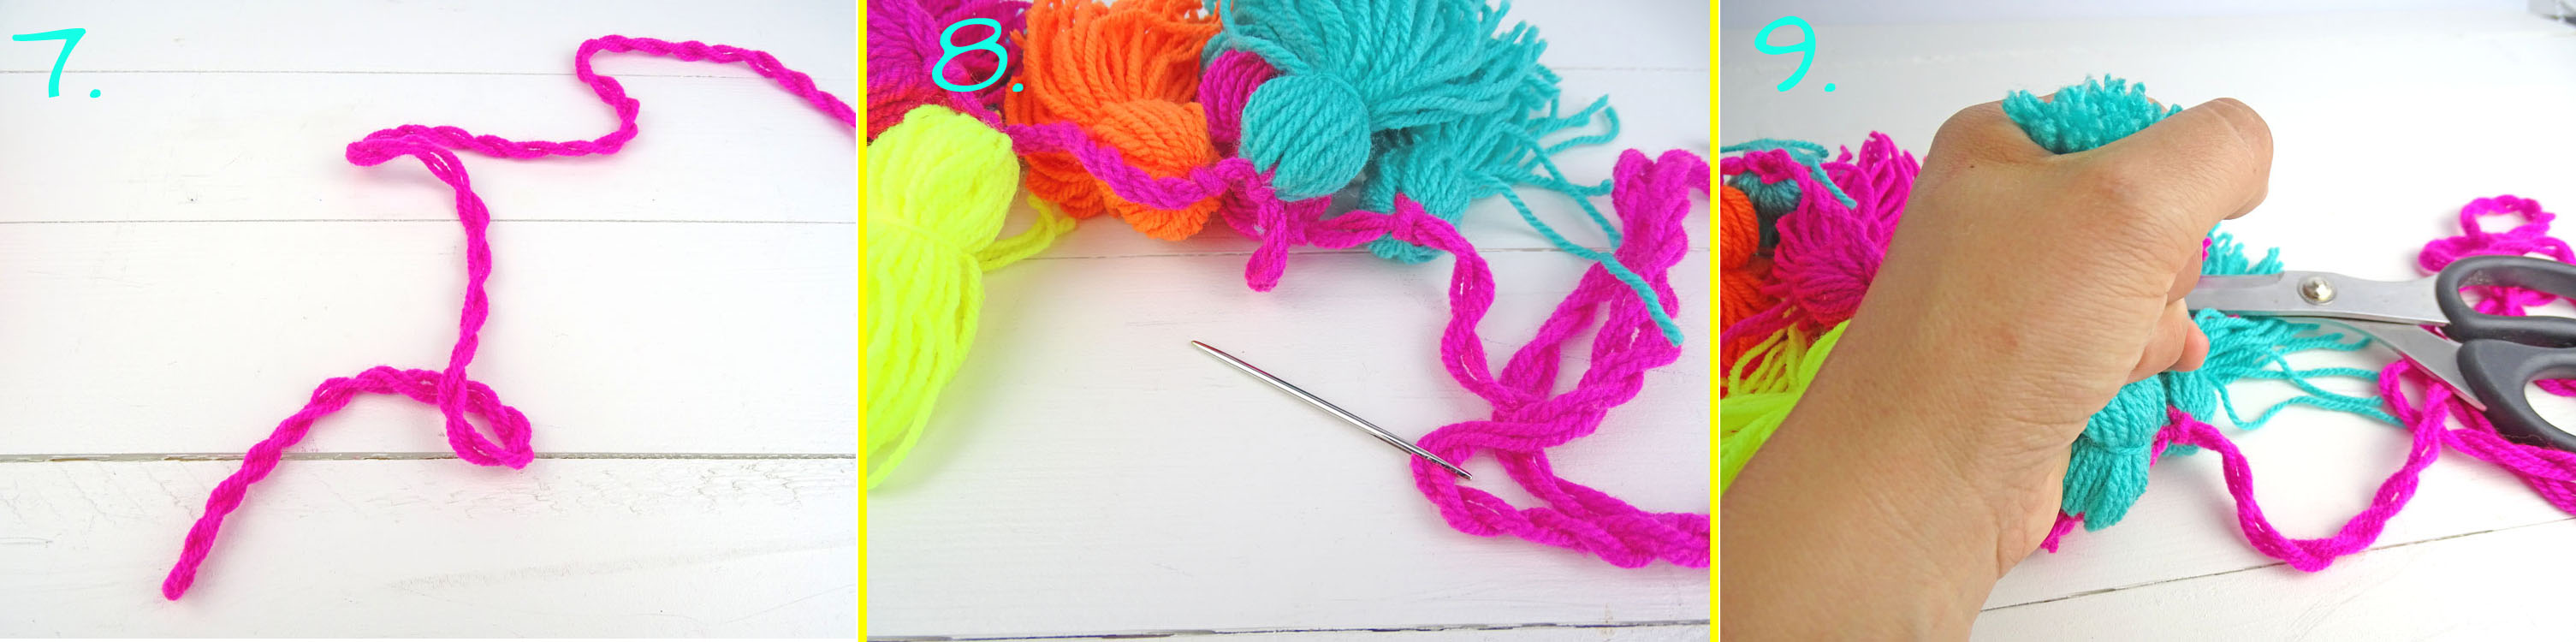 Anleitung 7-9 Tassel Girlande selbermachen DIY